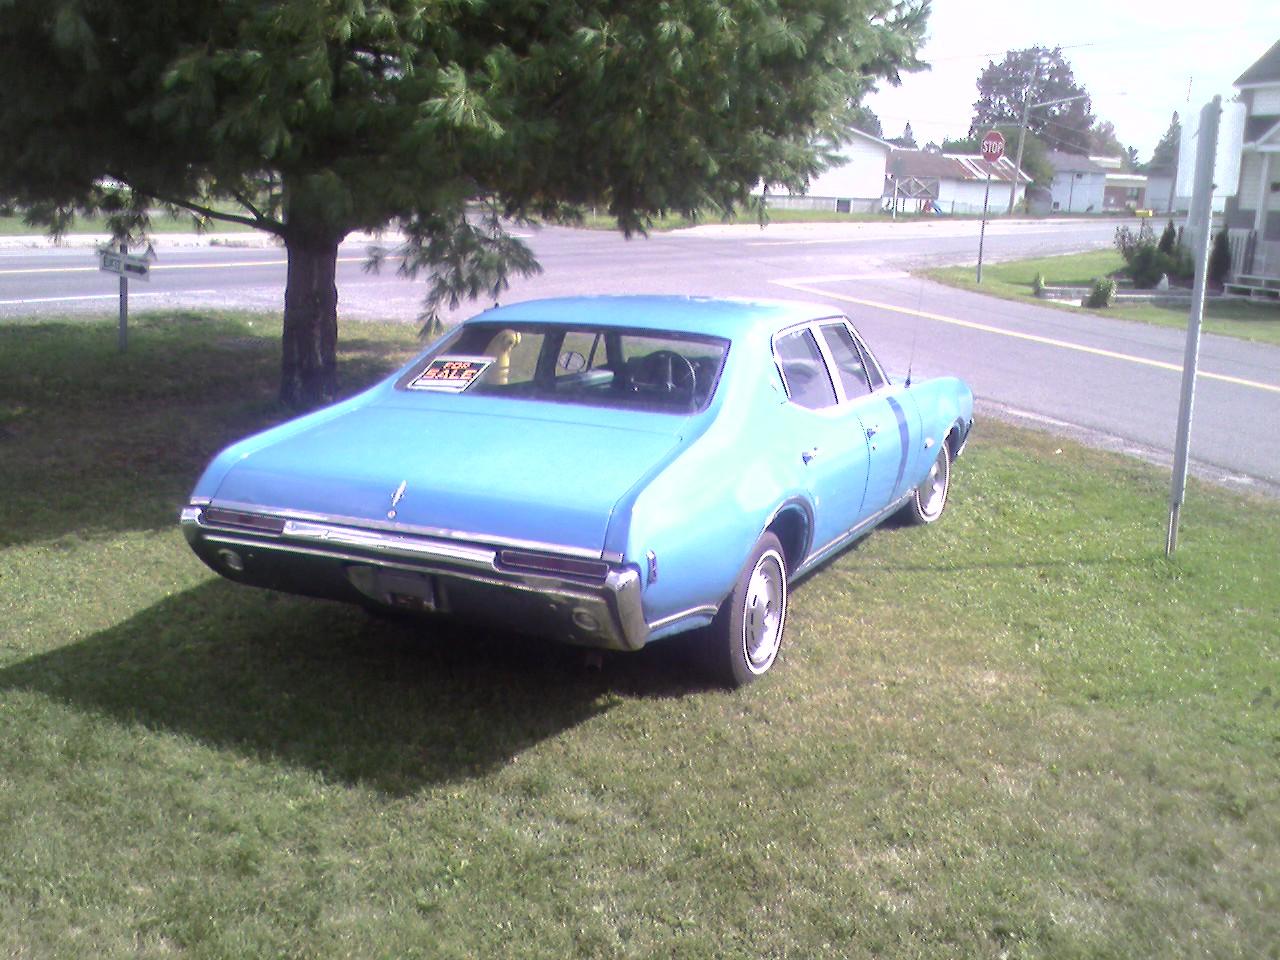 Oldsmobile cutlass supreme 2 door convertible side profile 81965 - 1968 Oldsmobile